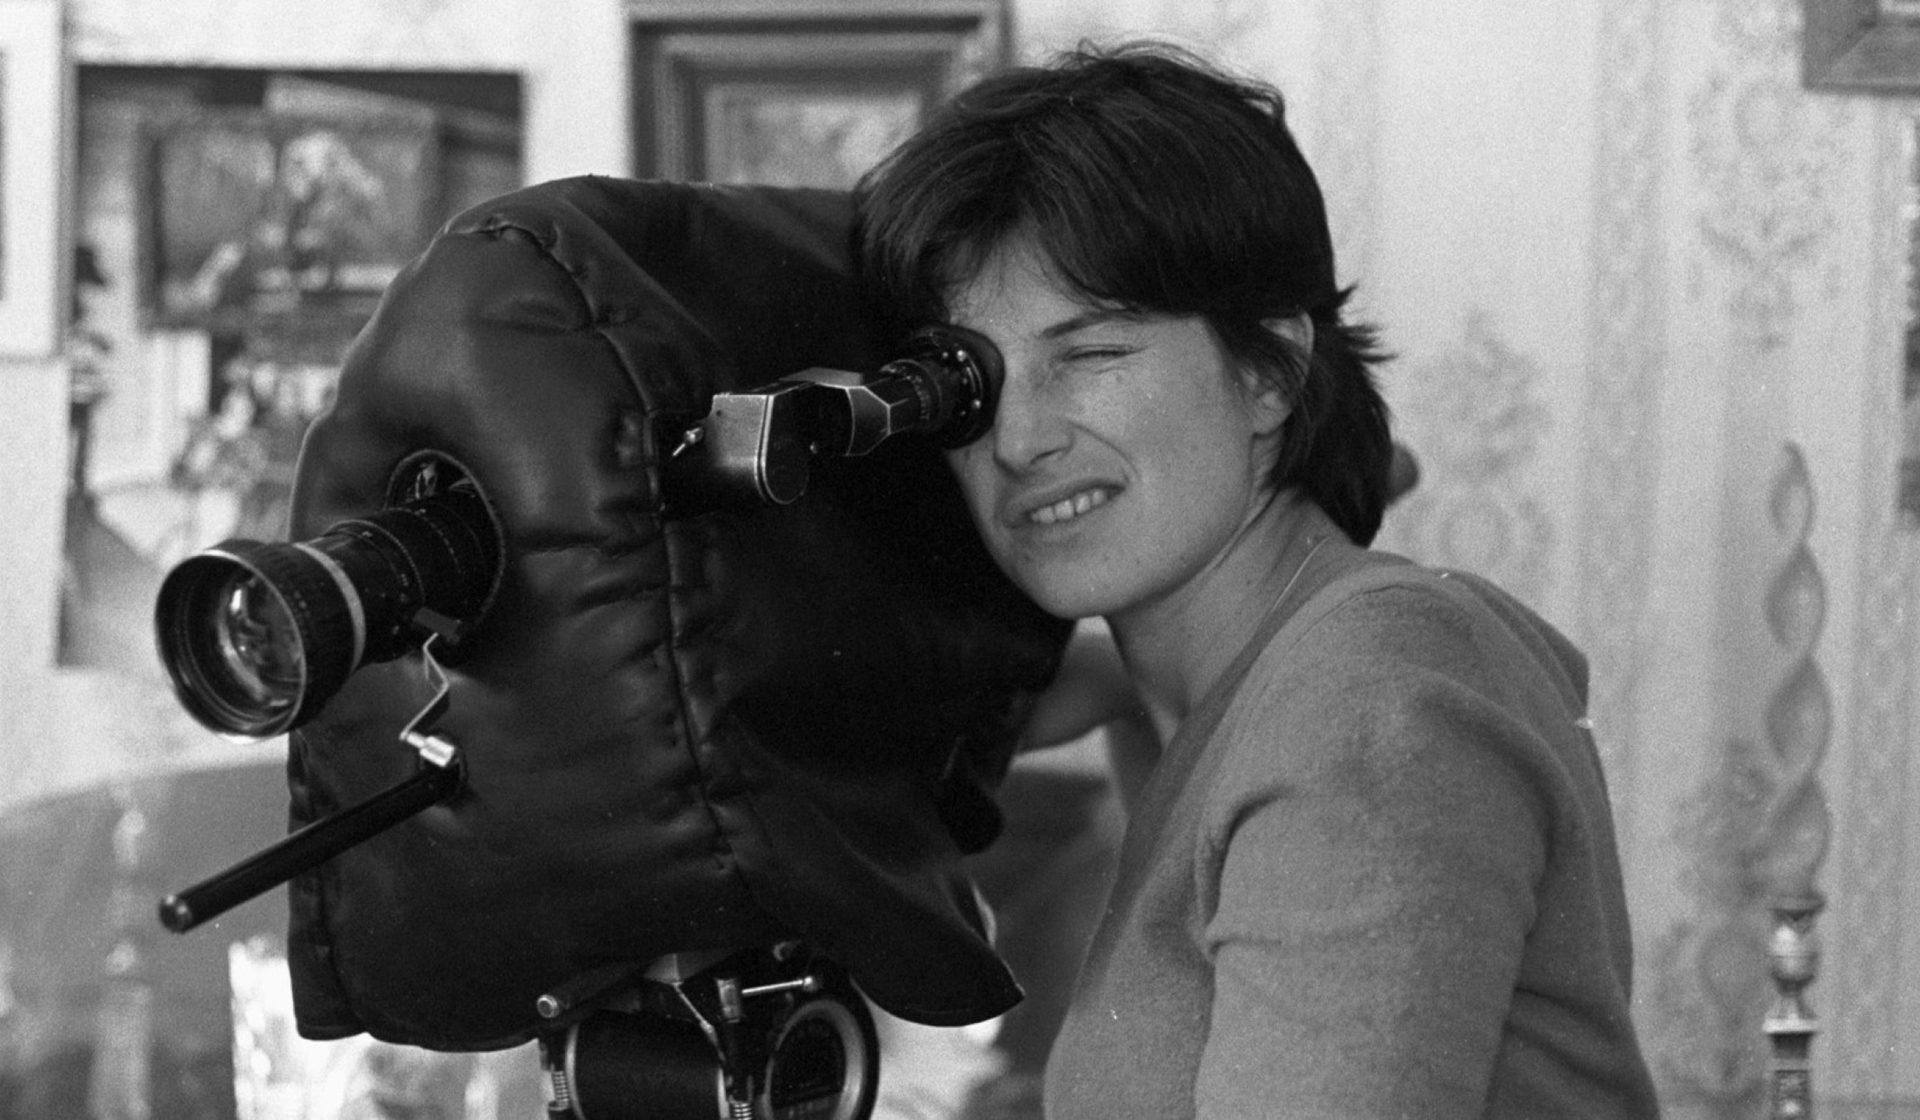 Ciclo Cine Feminista Artium. La directora Chantal Akerman